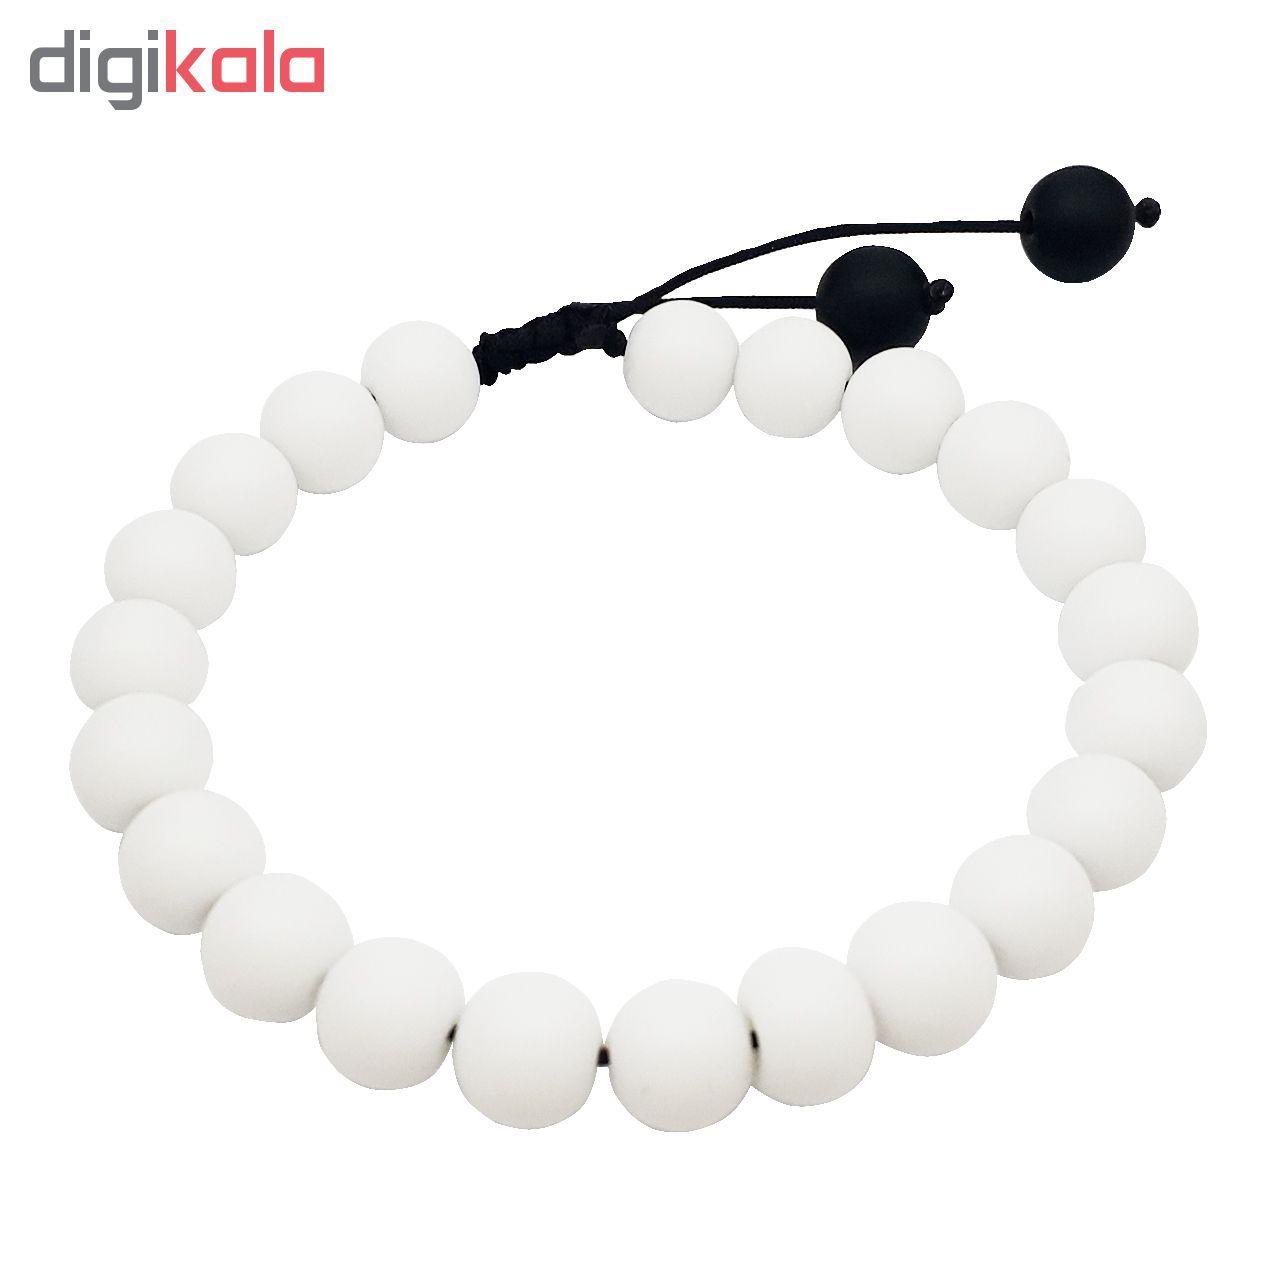 دستبند کد LDK-MH03 main 1 1